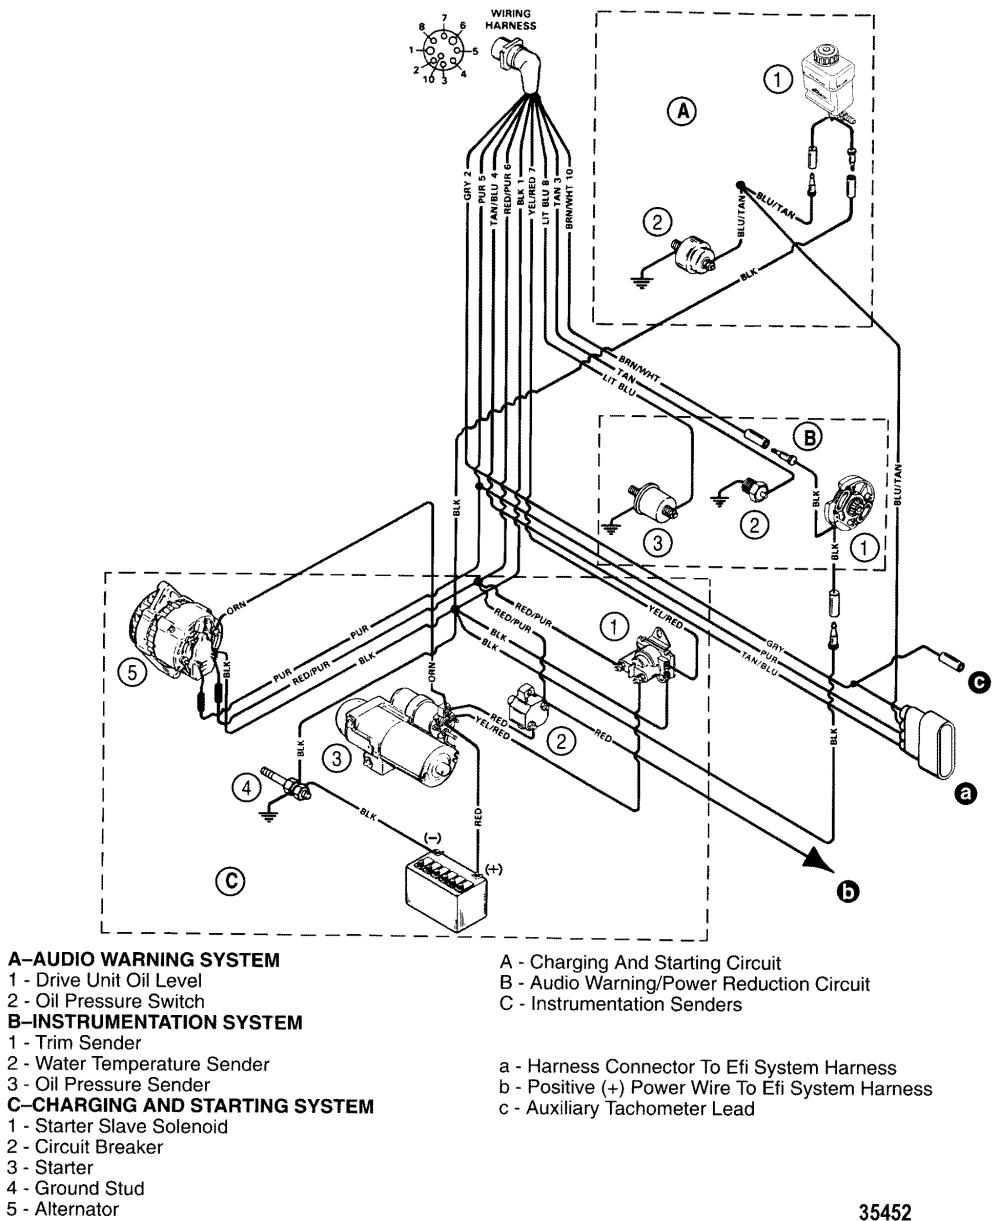 medium resolution of 5 7l efi 2 bbl tbi gm 350 v 8 1997 serial 0k001506 thru 0k999999 wiring harness engine